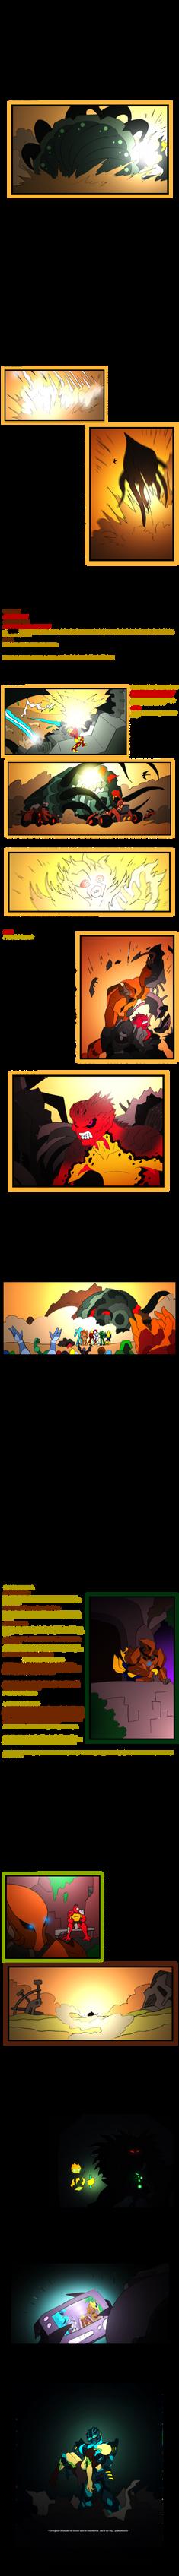 Bionicle- Nova Orbis- Mystery- FINAL CHAPTER